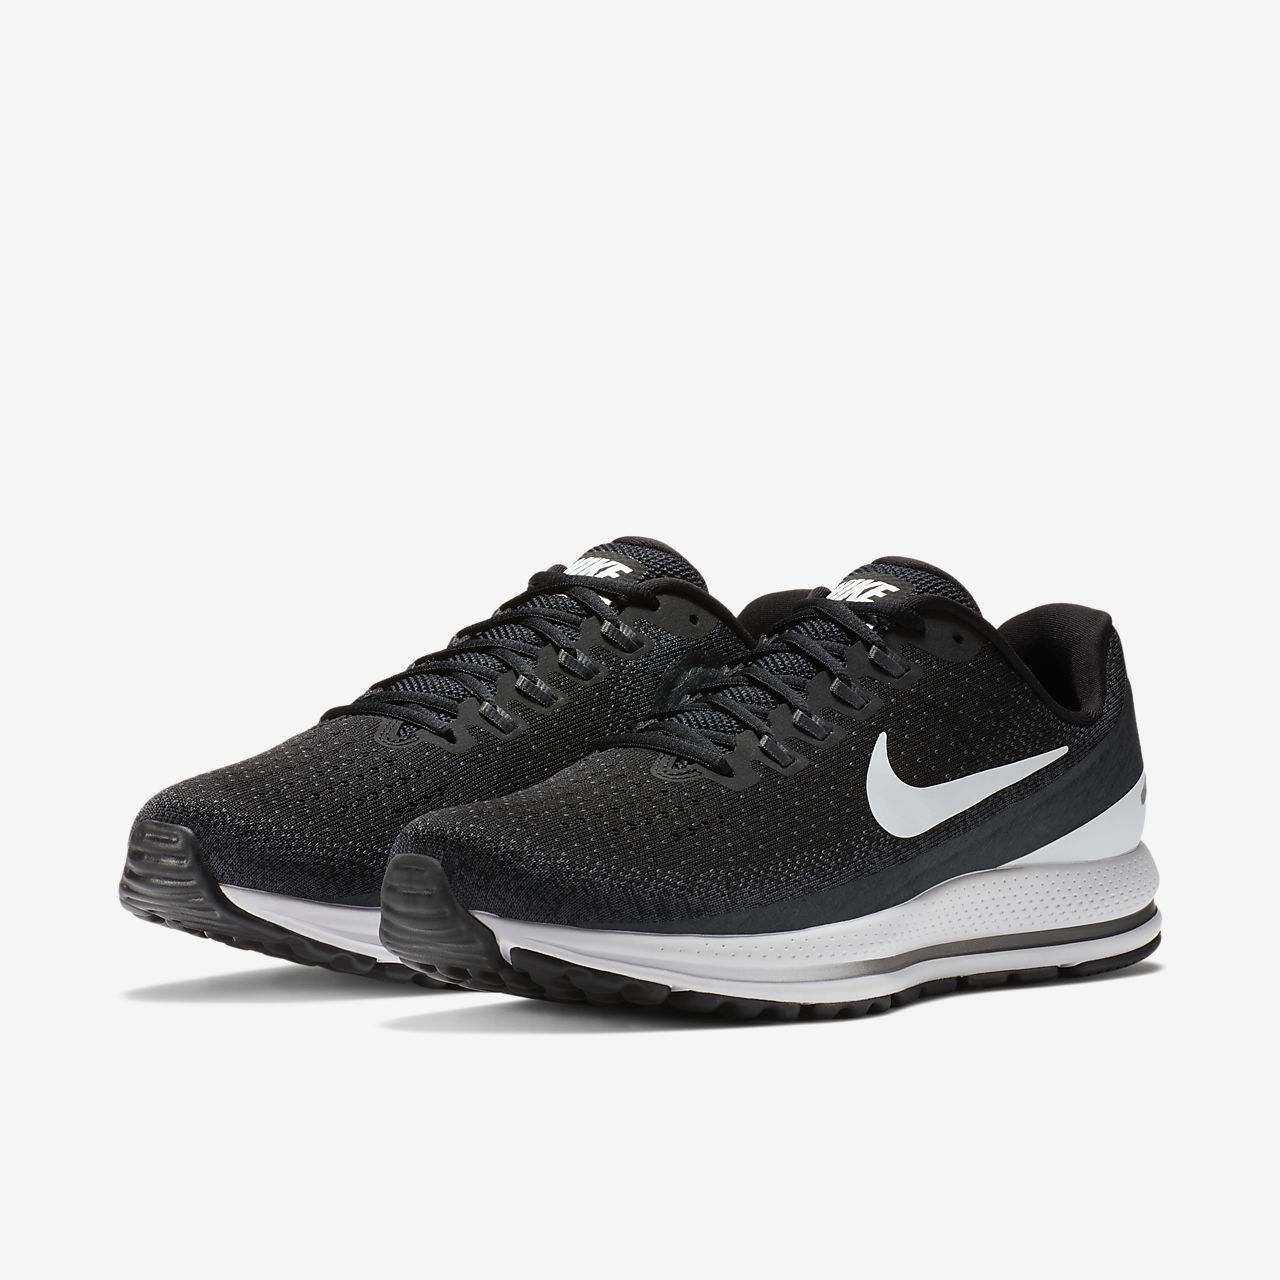 ... Nike Air Zoom Vomero 13 (Wide) Men's Running Shoe